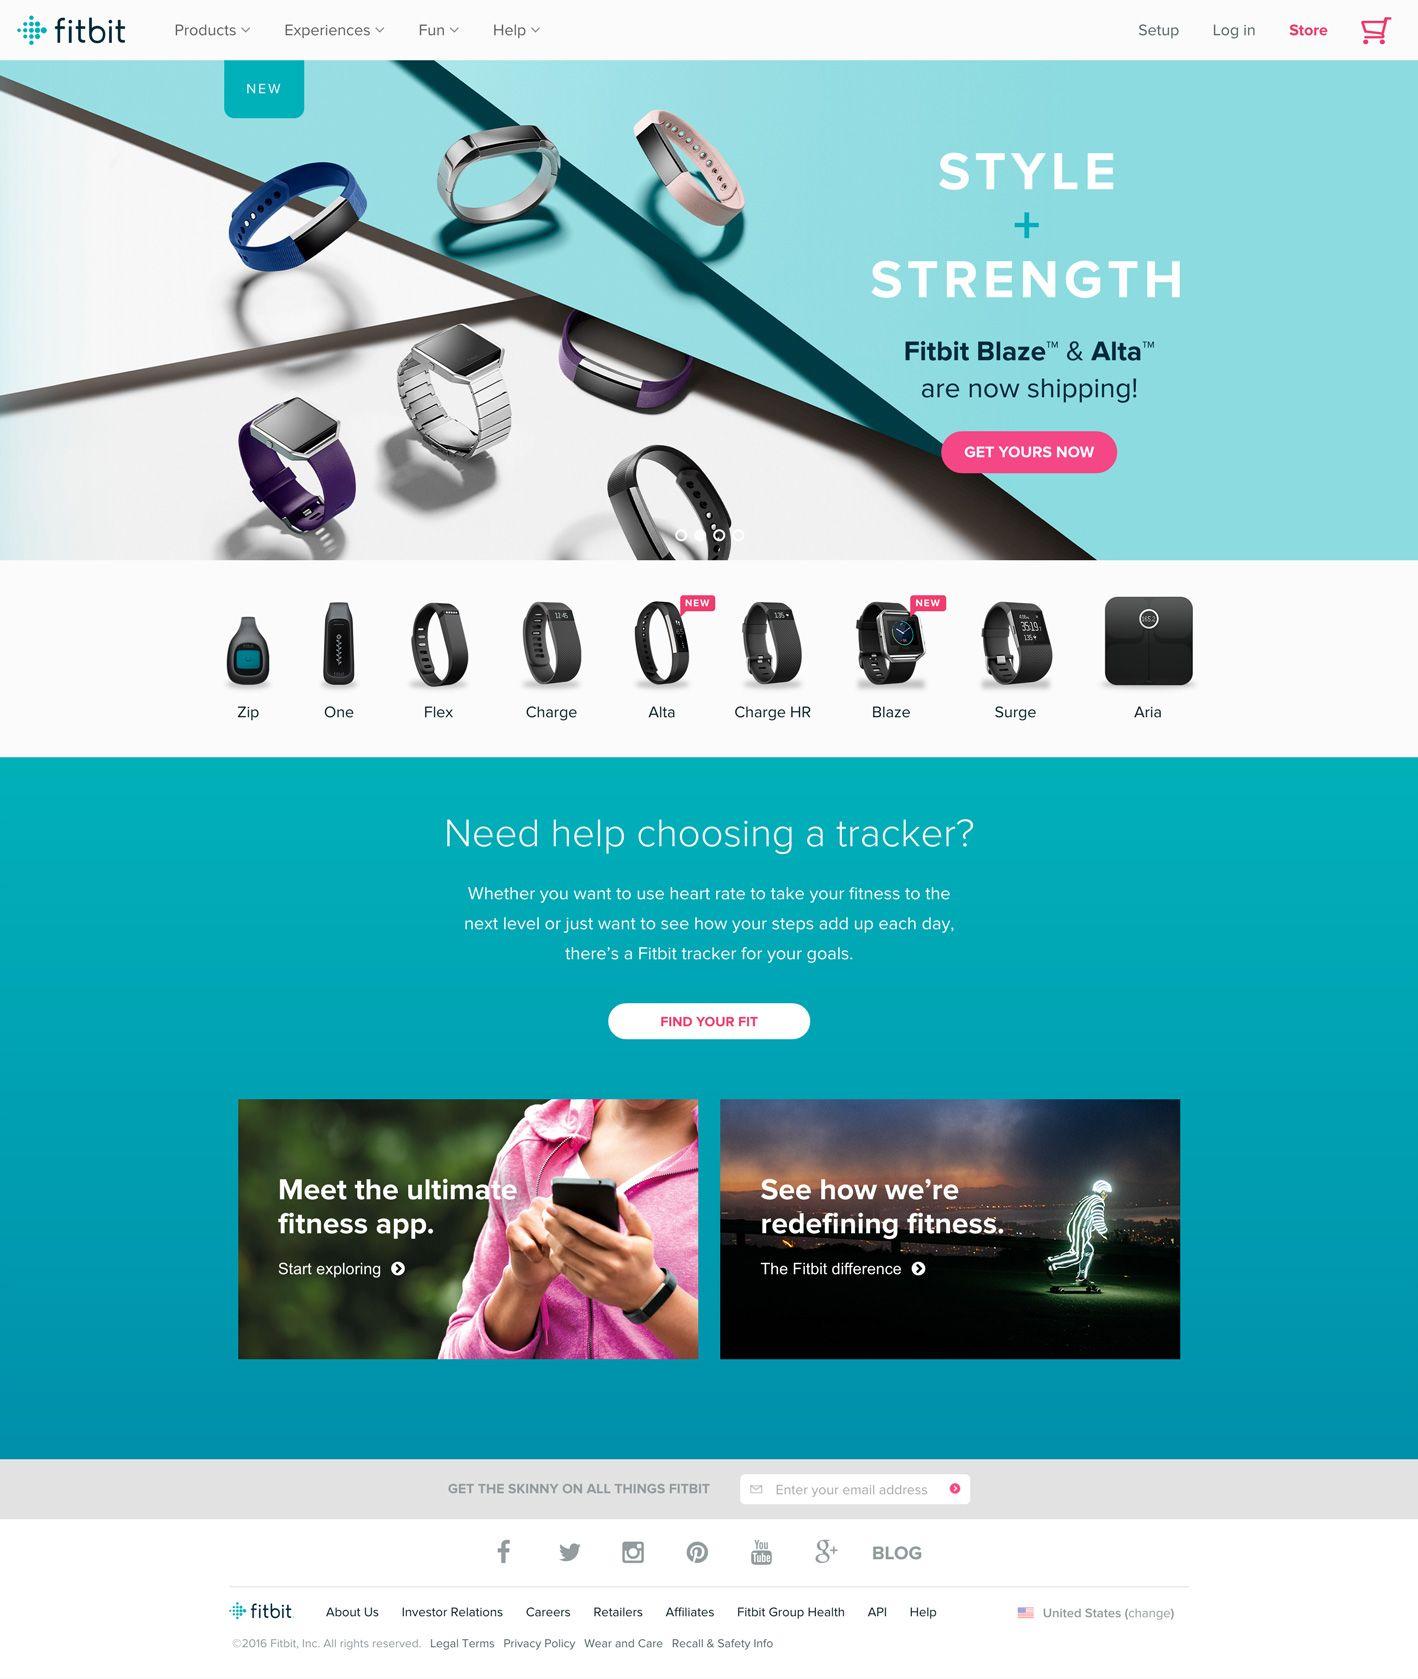 Web Design Inspiration For A Medical Or Health Company Snap Agency Web Design Web Design Inspiration Design Inspiration